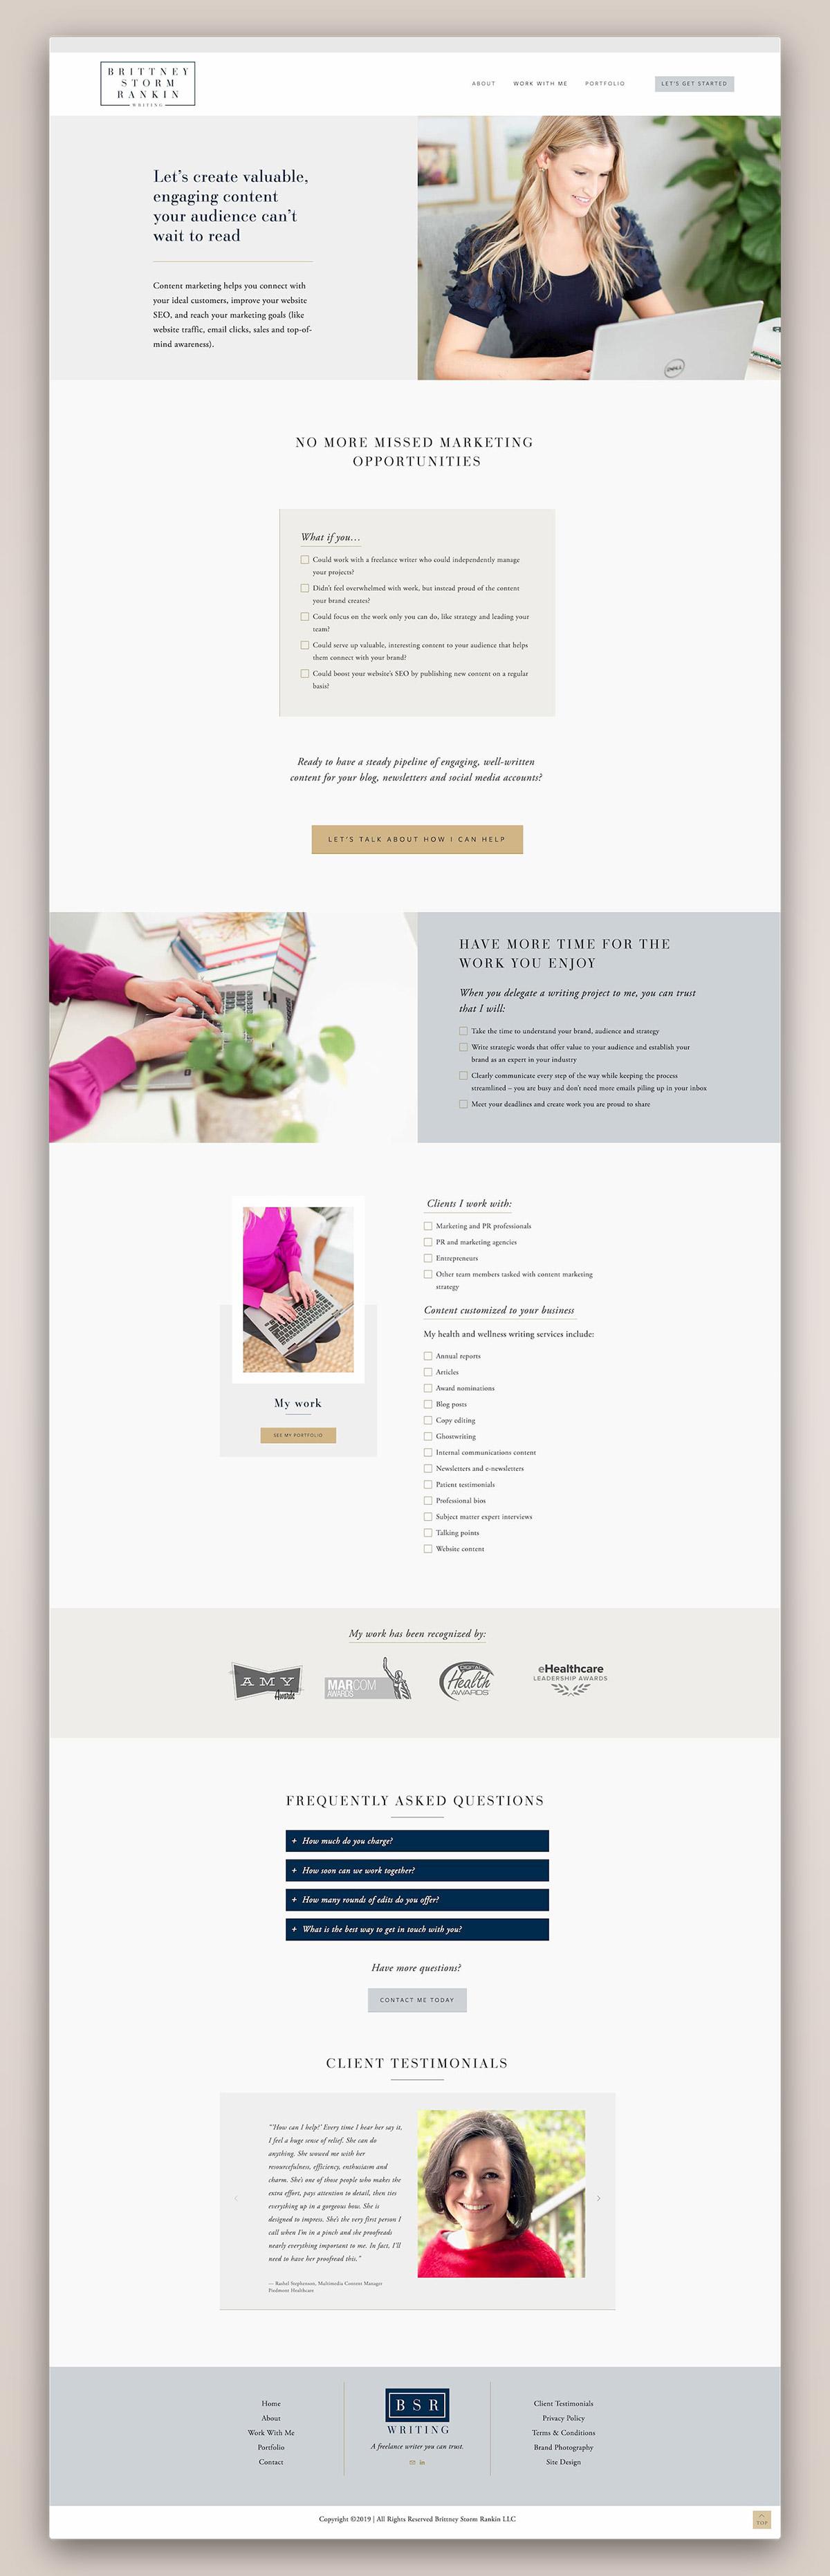 Home page    Brittney Storm Rankin Writing   webdesign by Jodi Neufeld Design.jpg